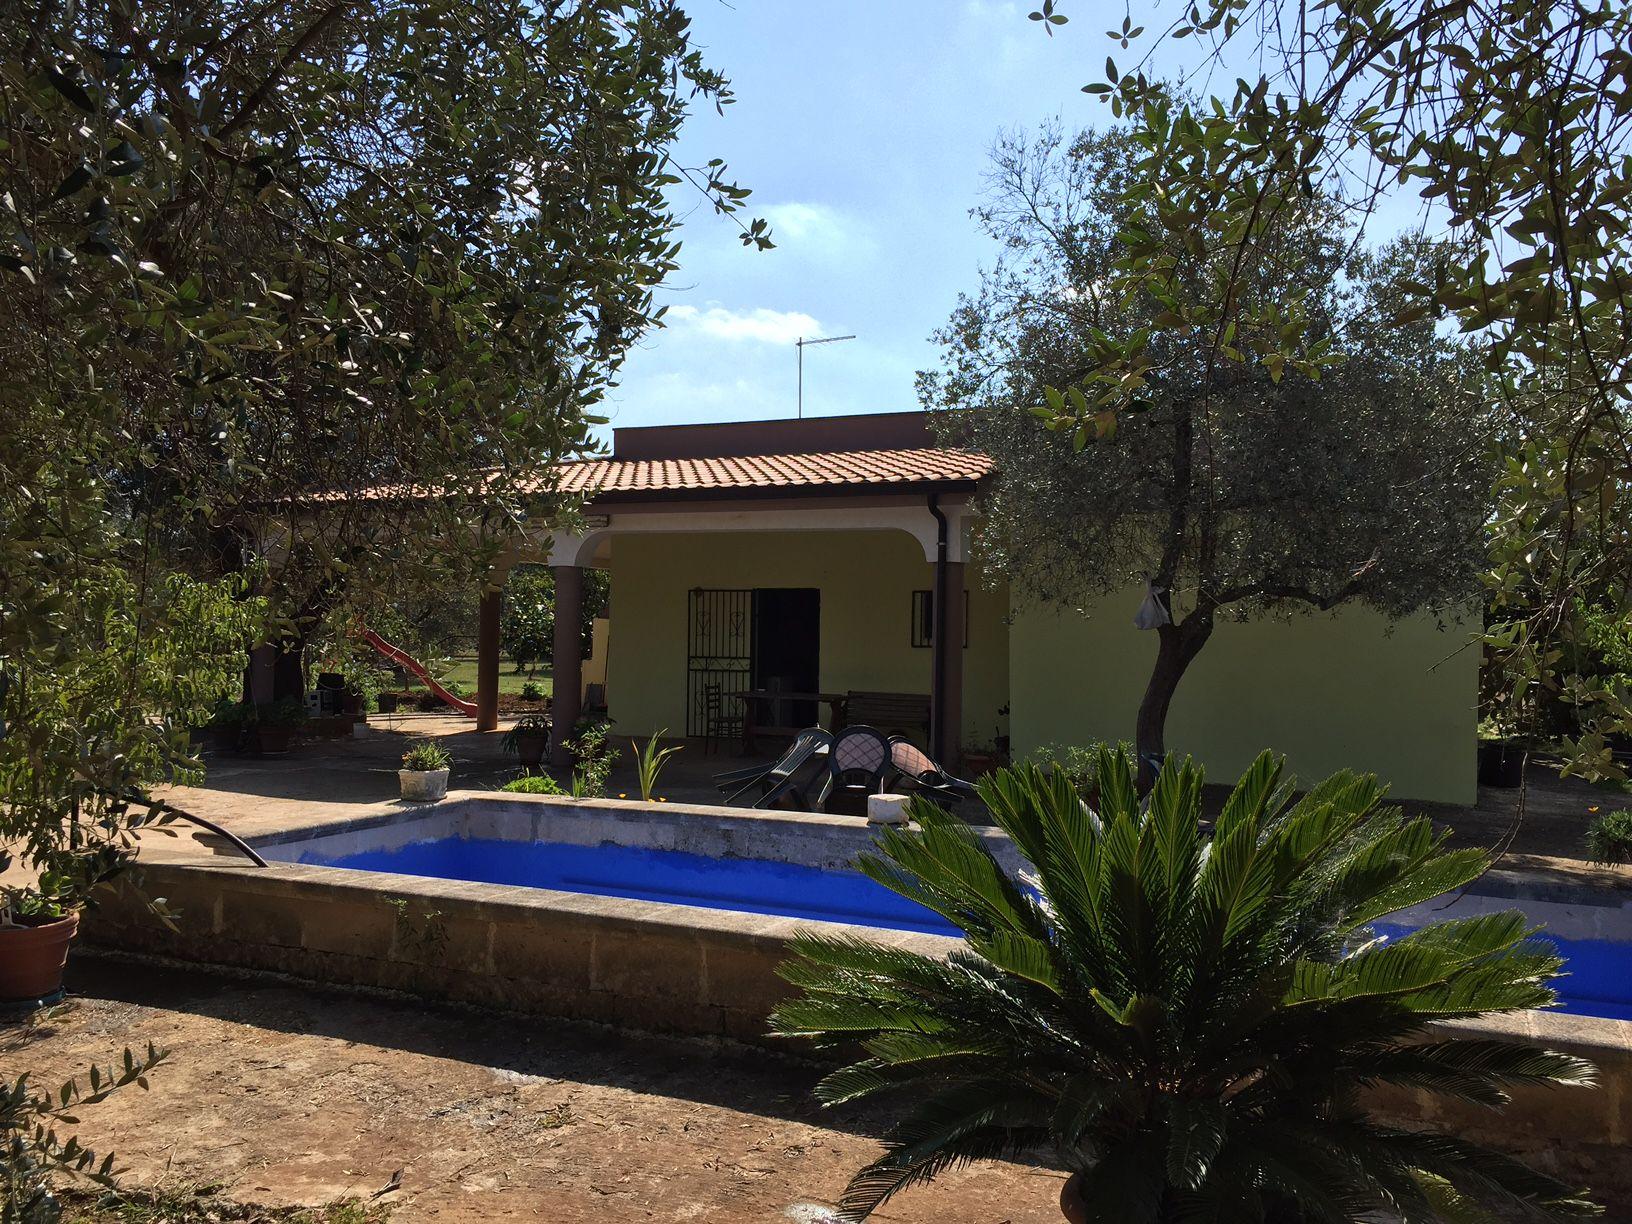 Villa in vendita francavilla fontana uliveto e piscina - Ville in vendita con piscina ...